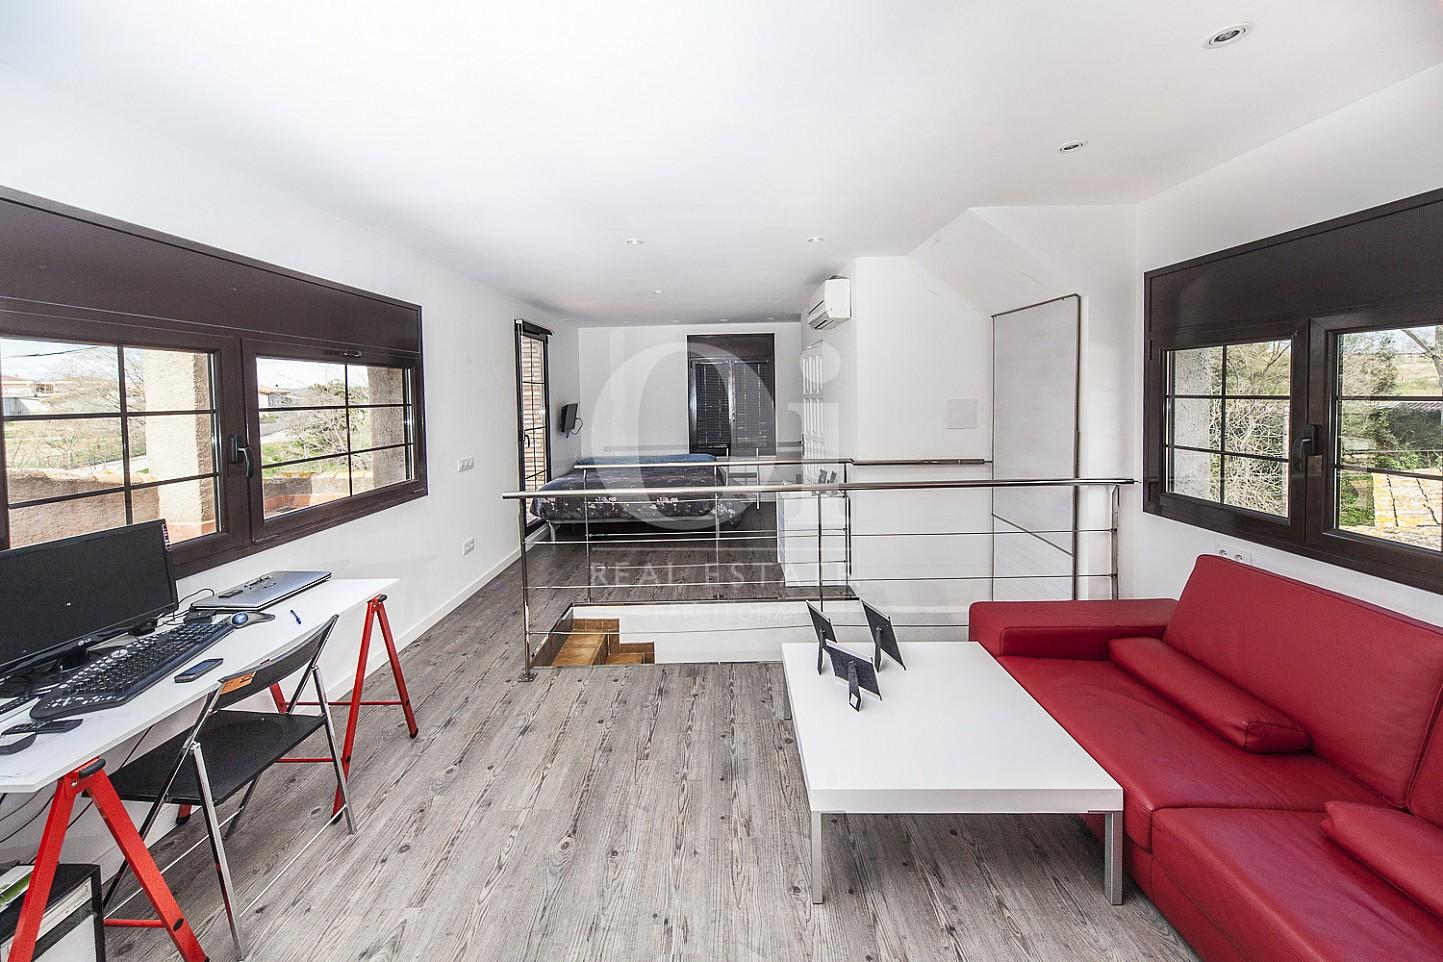 Zona loft de casa en venta en Borrassà, alto Ampurdán, Gerona